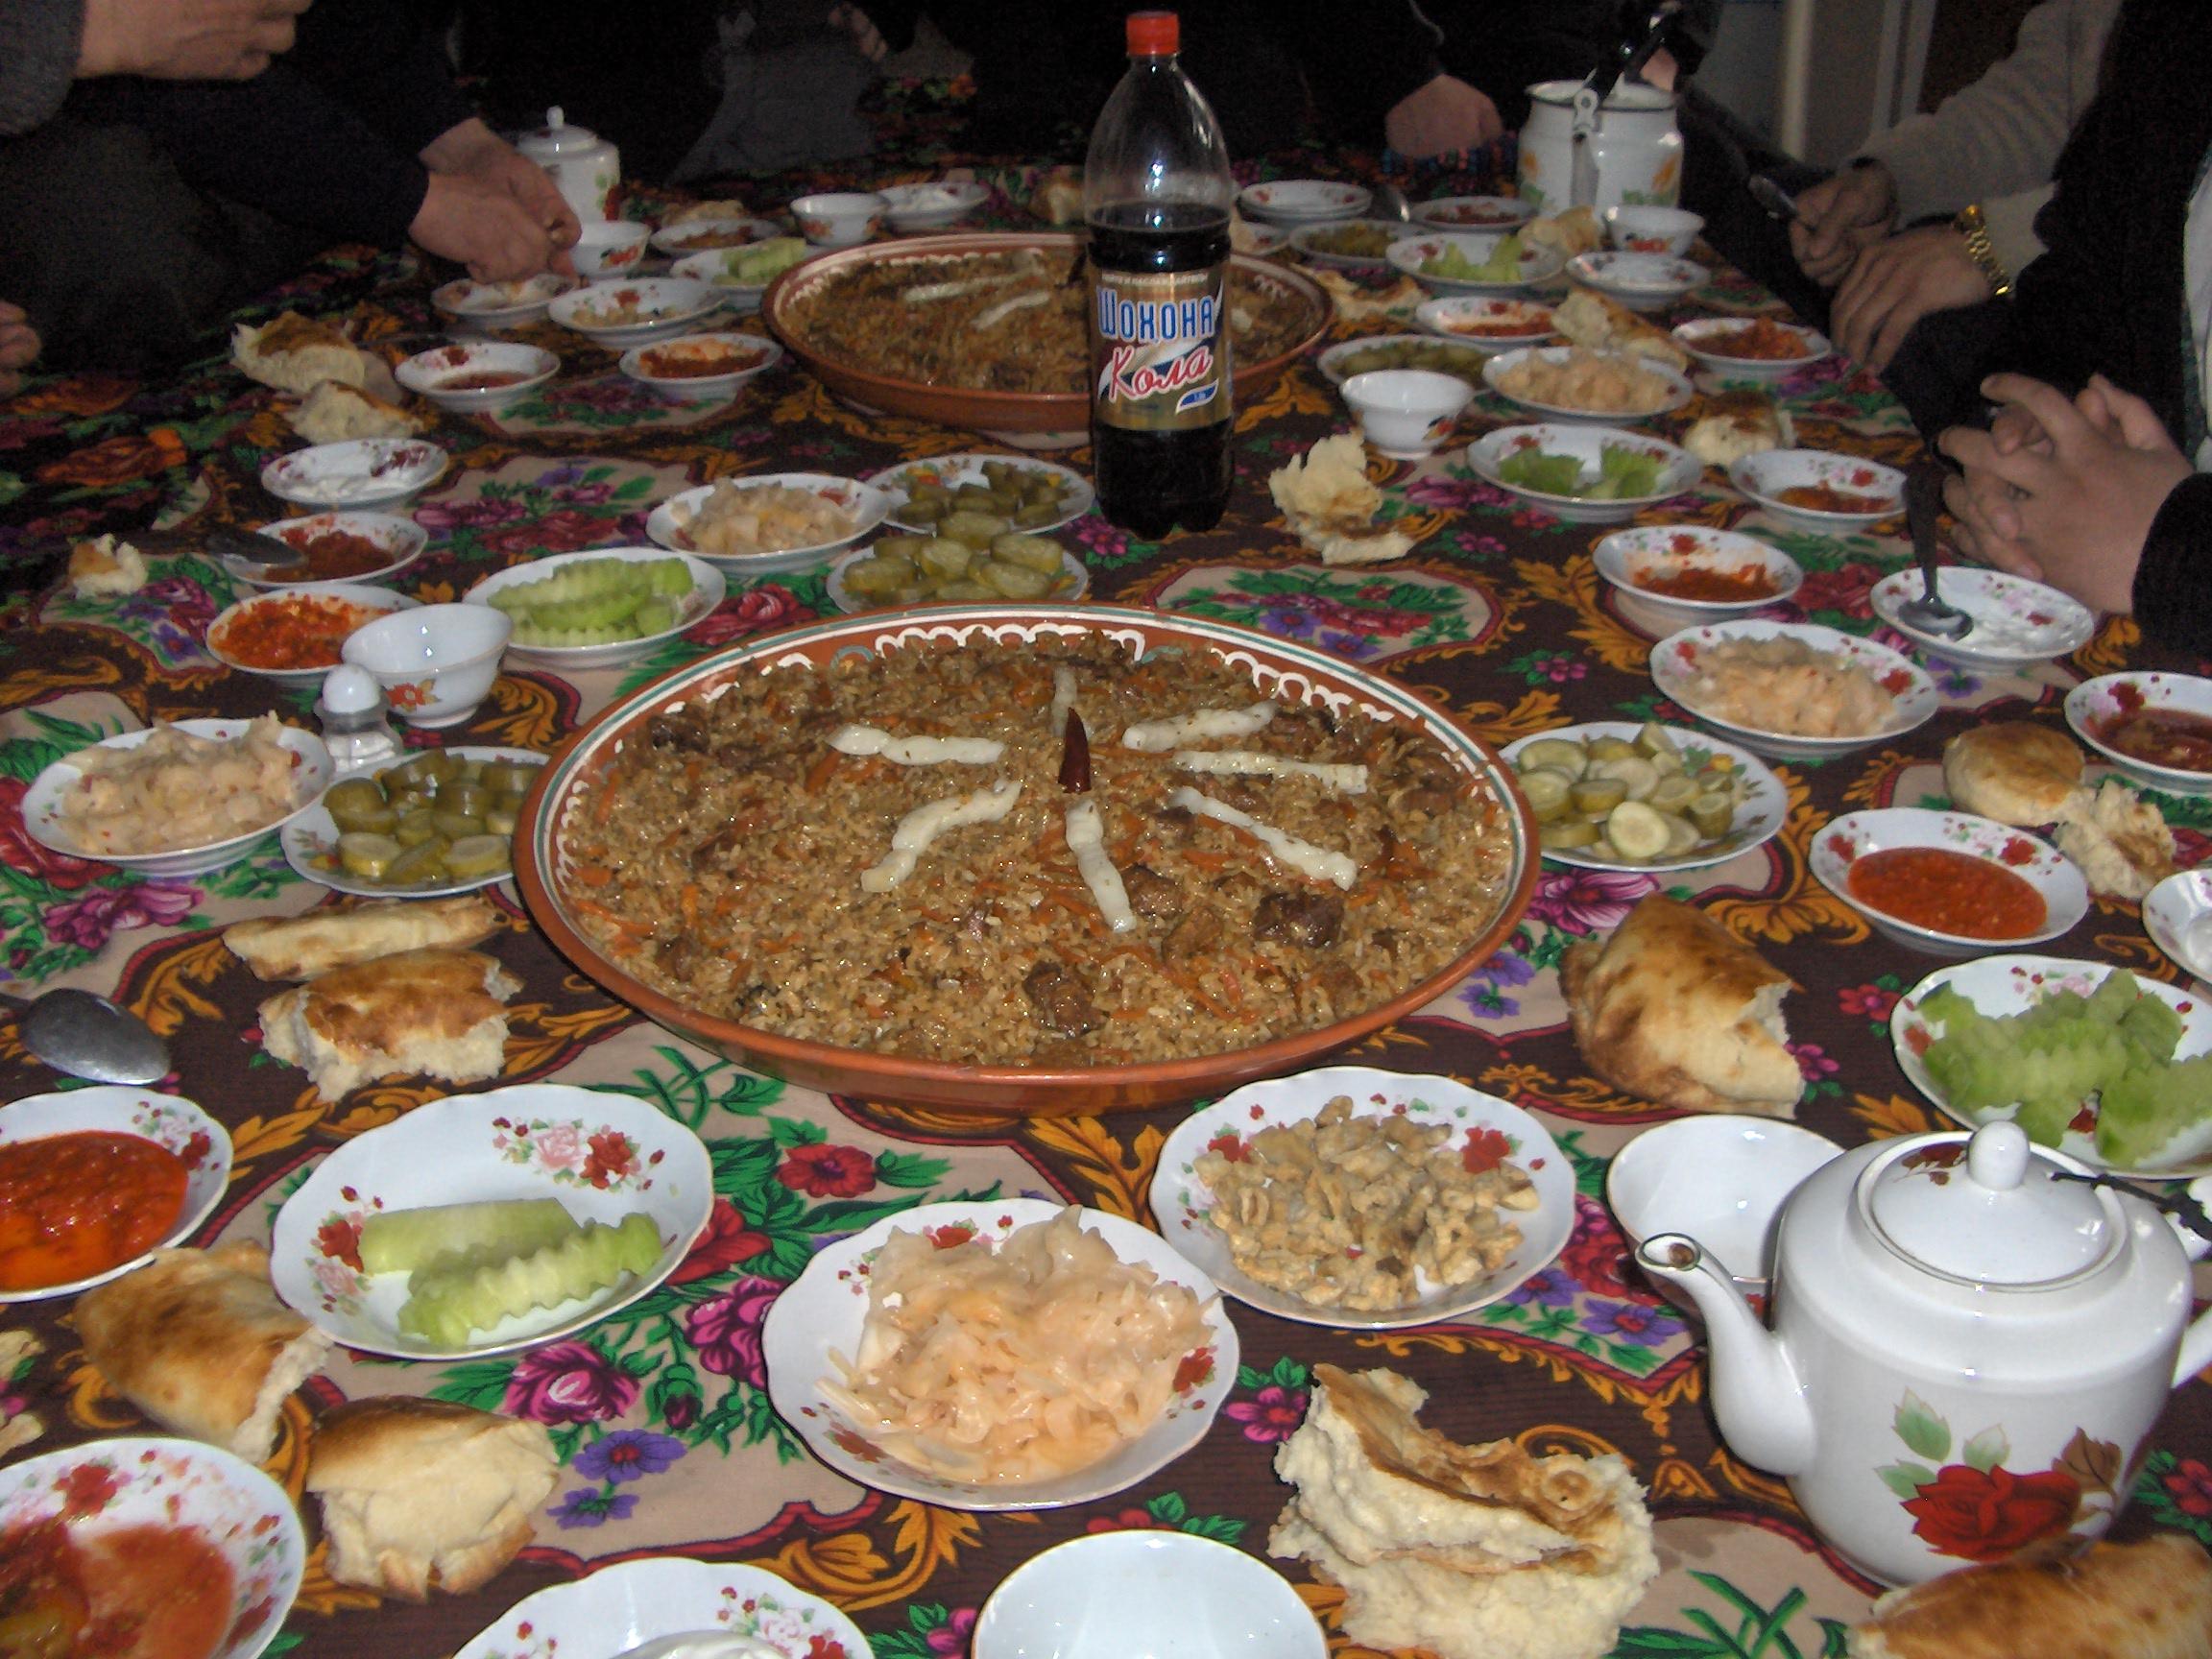 Hidangan Tajikistan Wikipedia Bahasa Indonesia Ensiklopedia Bebas